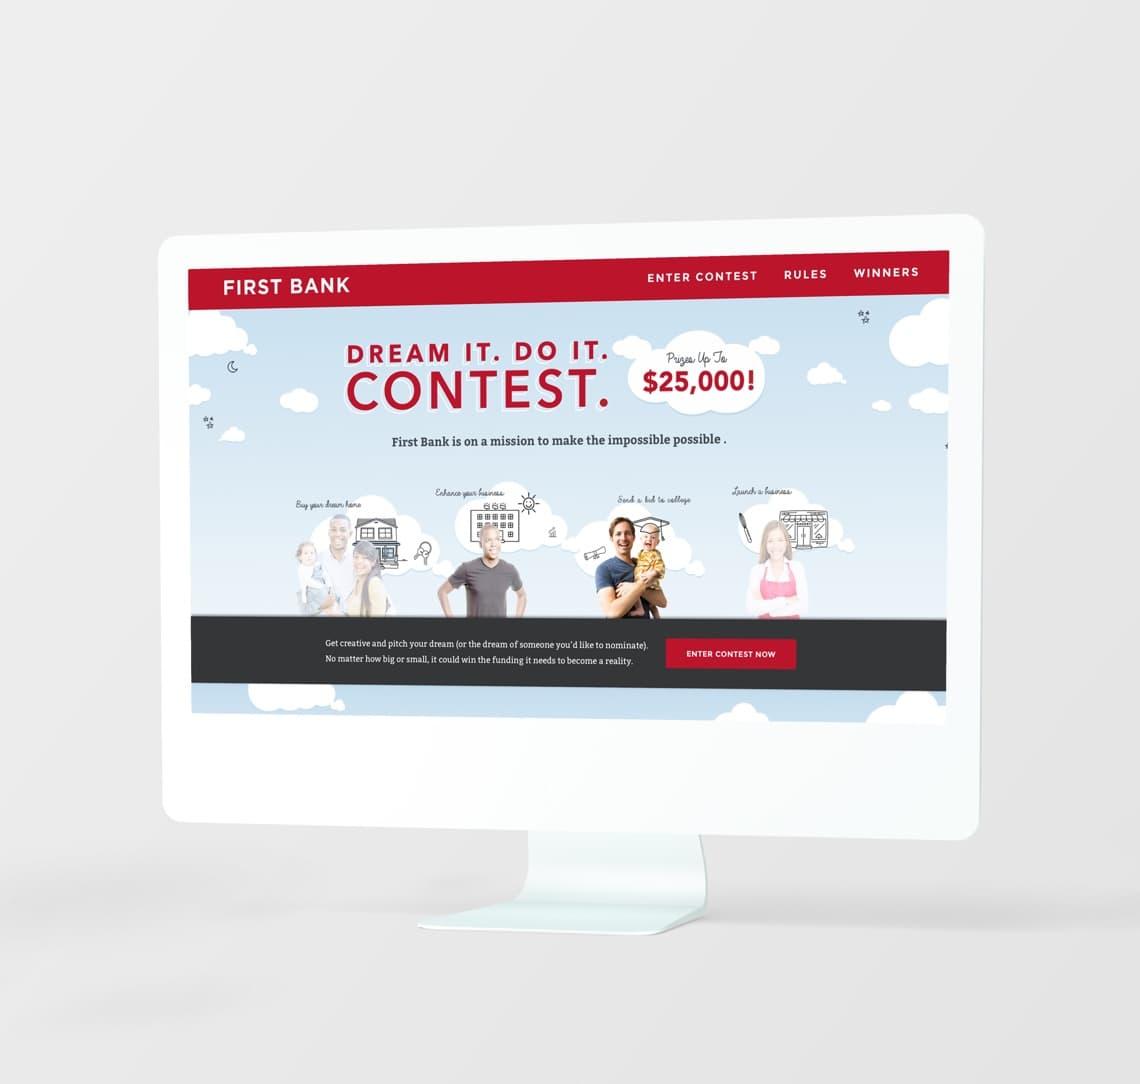 First Bank. Dream It. Do It. Contest It. on desktop